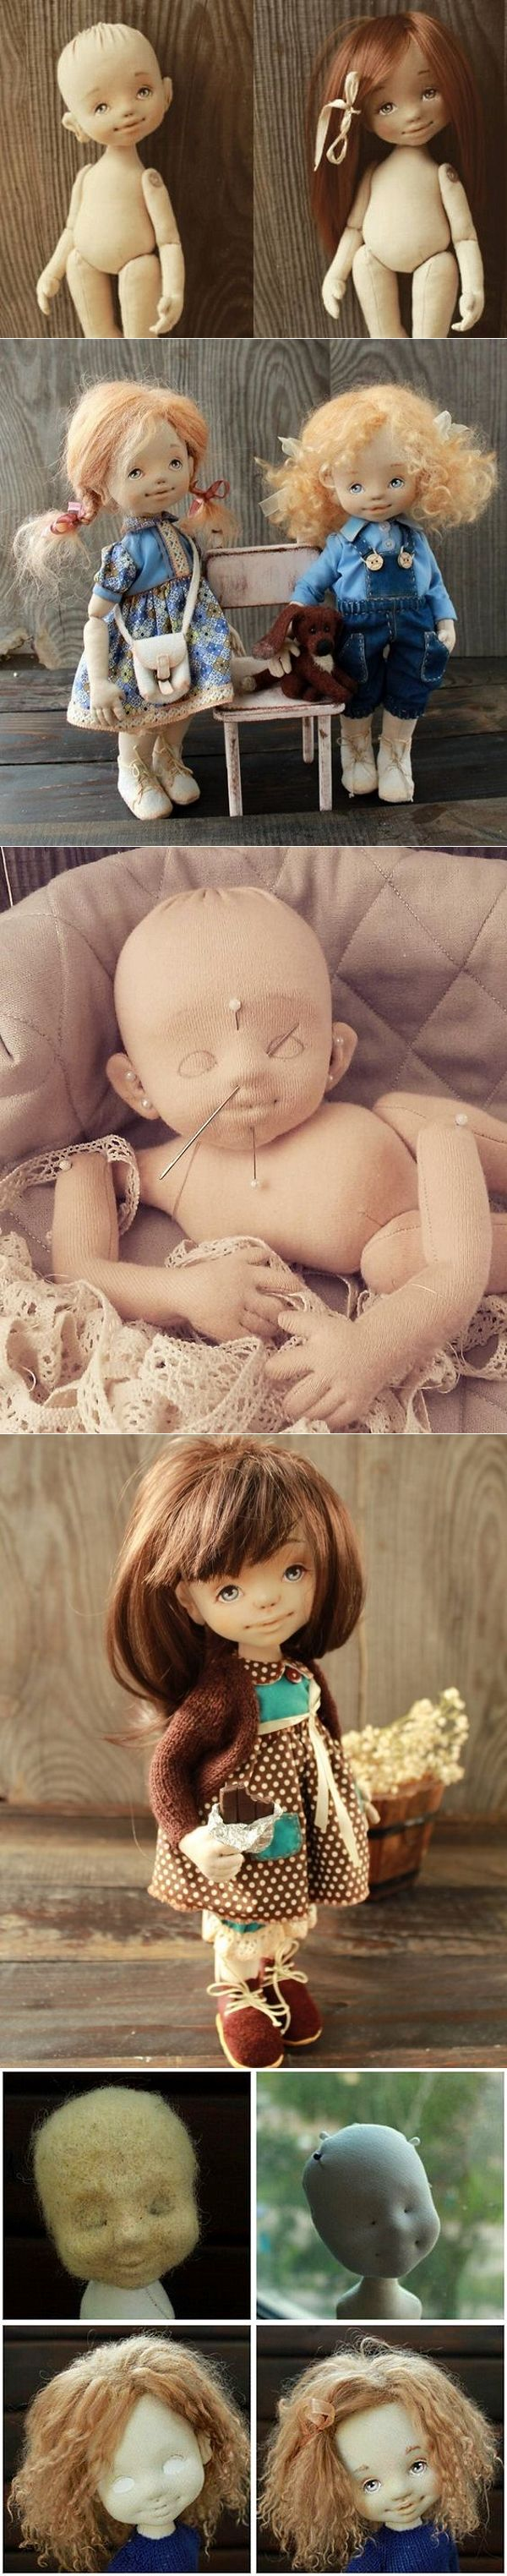 all-dolls.net